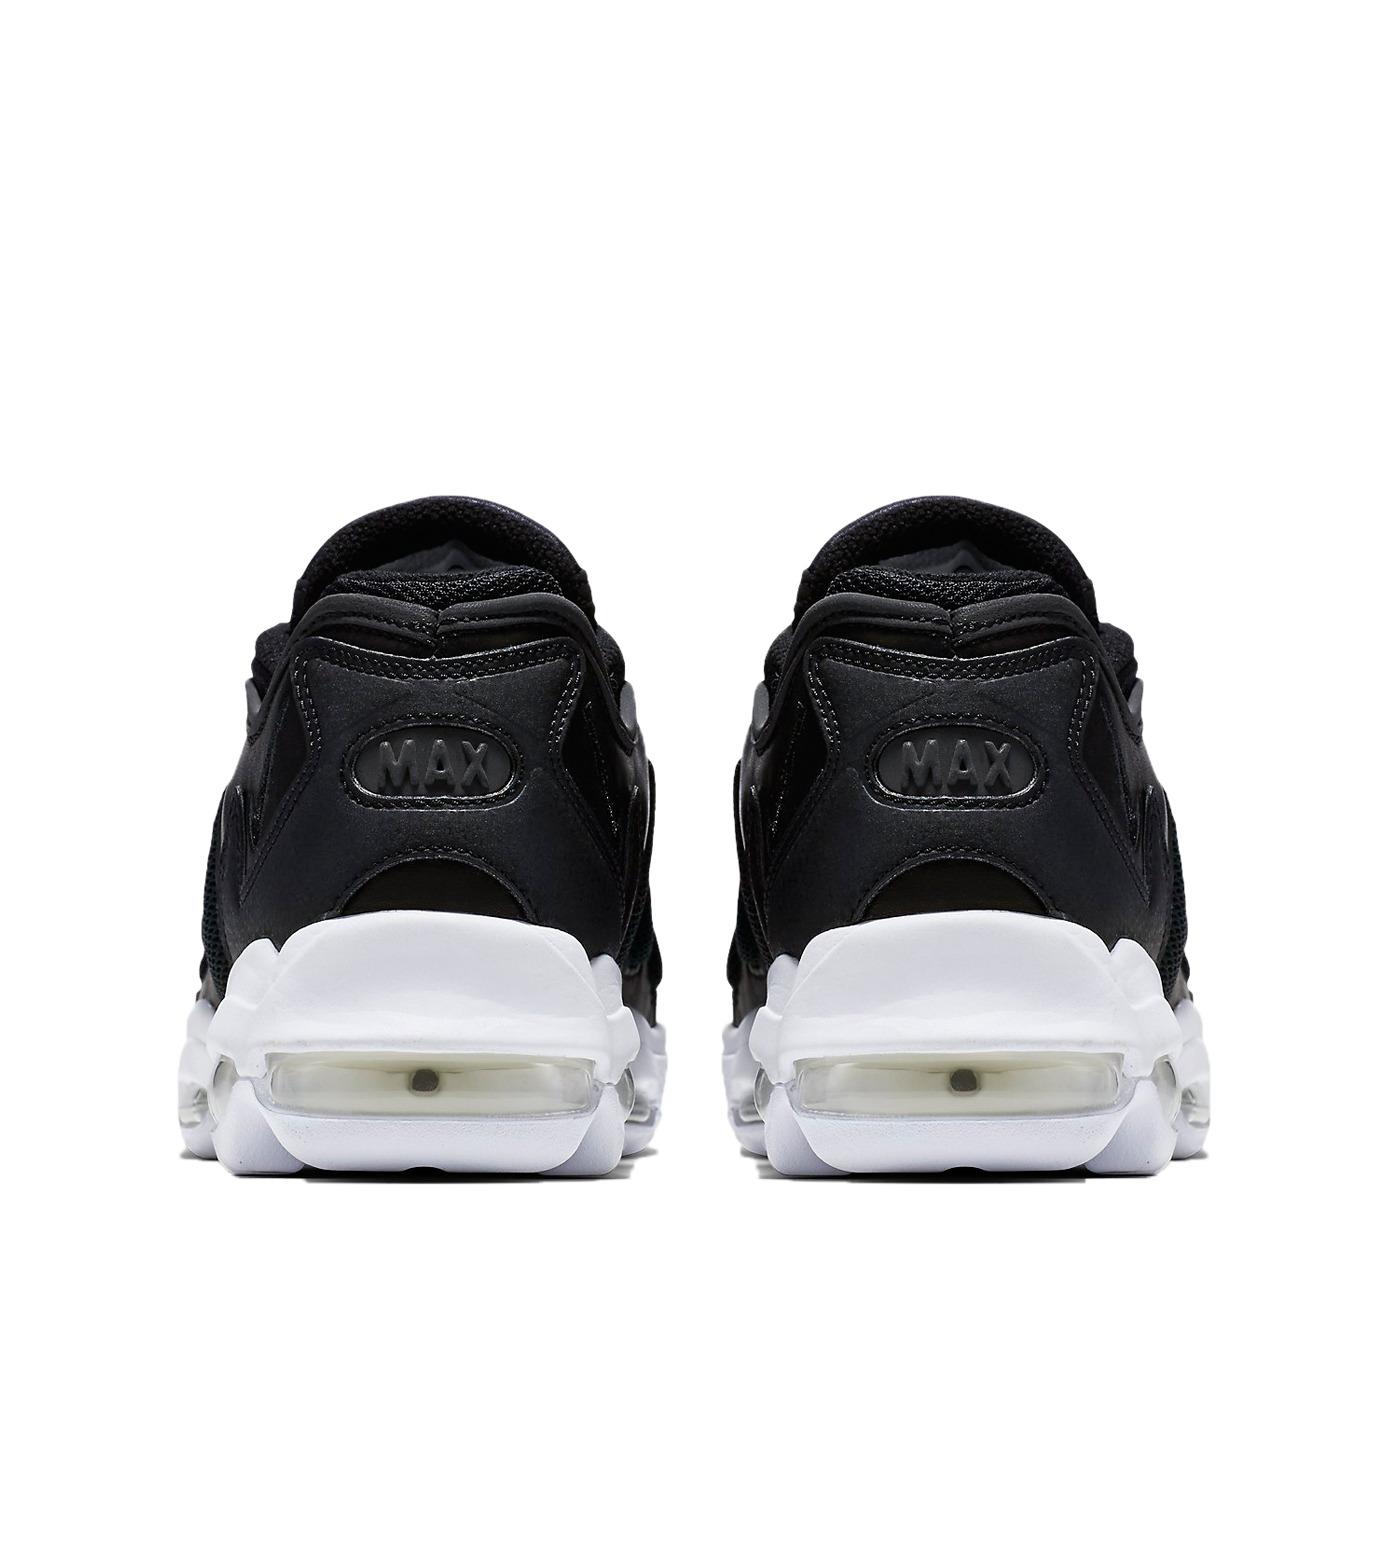 NIKE(ナイキ)のAIR MAX 96 XX-BLACK(シューズ/shoes)-870165-002-13 拡大詳細画像5